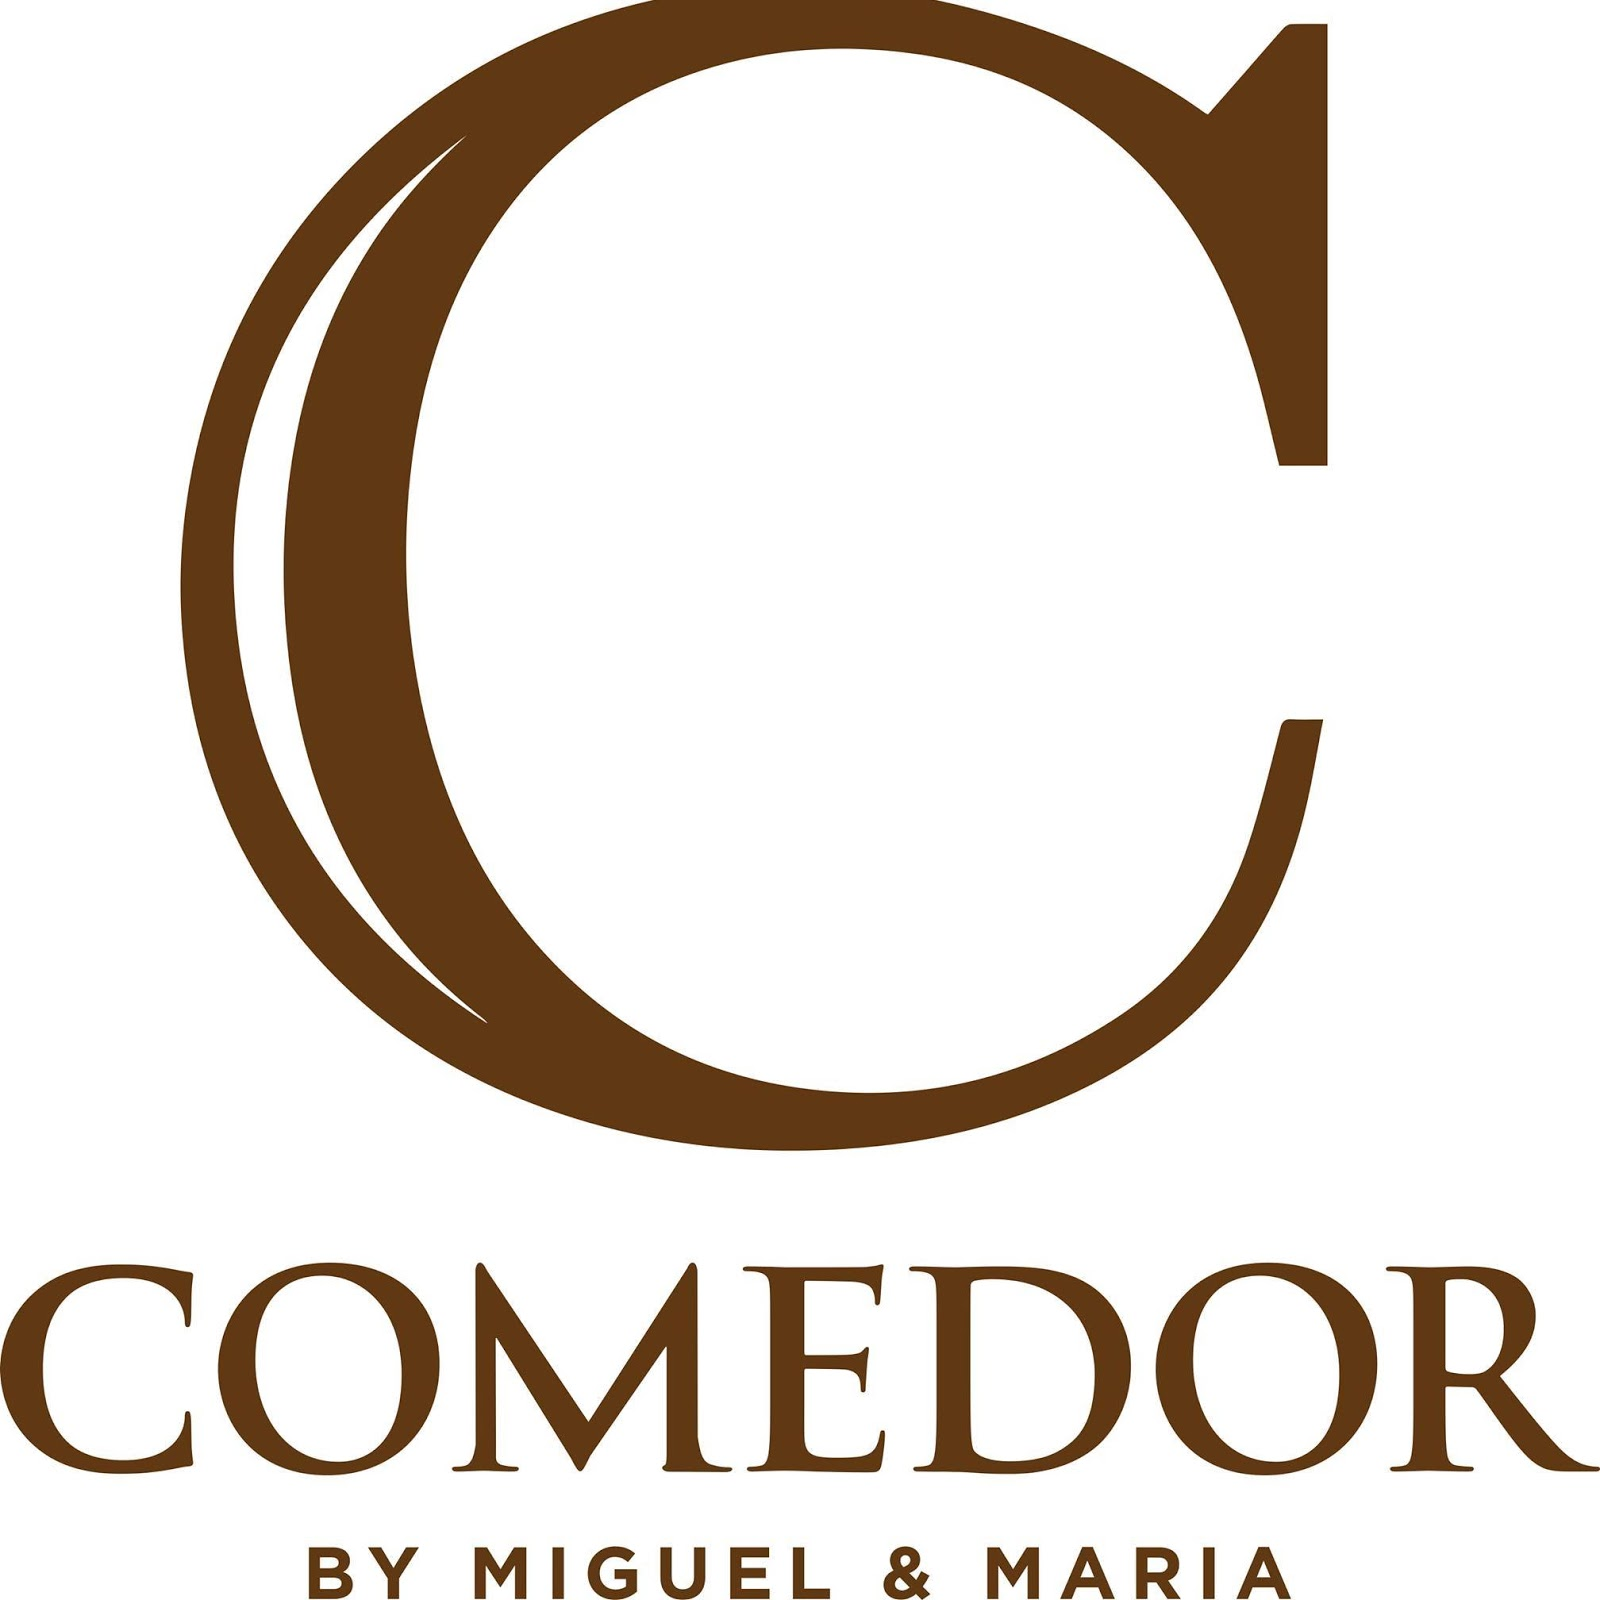 Comedor by miguel maria sizzling kare kare bacon for Comedor logo